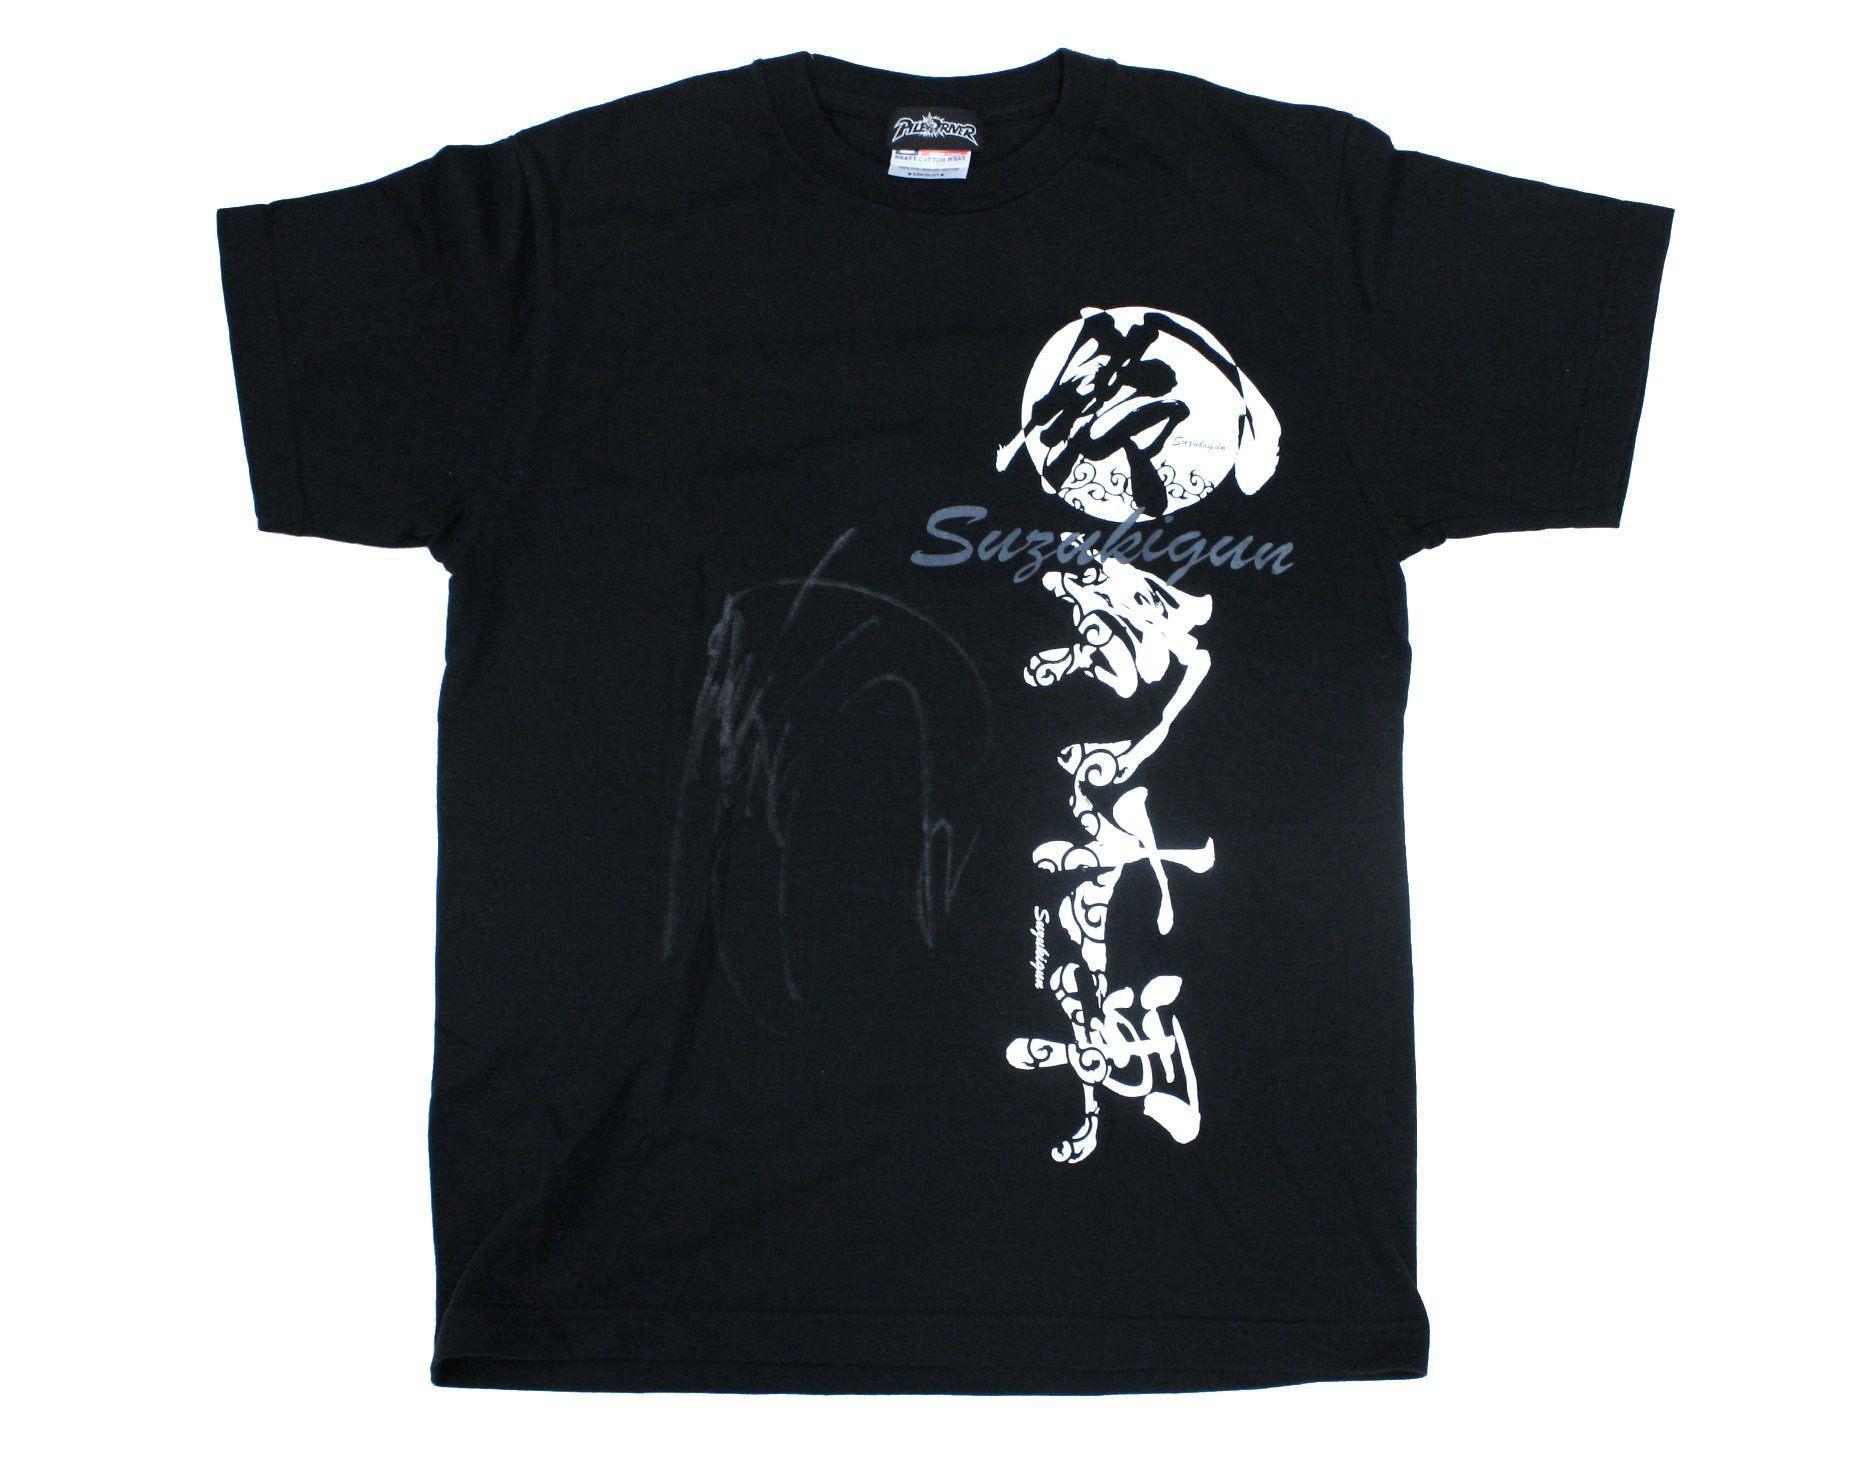 Minoru Suzuki Suzukigun T Shirt Medium Signed T Shirt Shirts Mens Tops